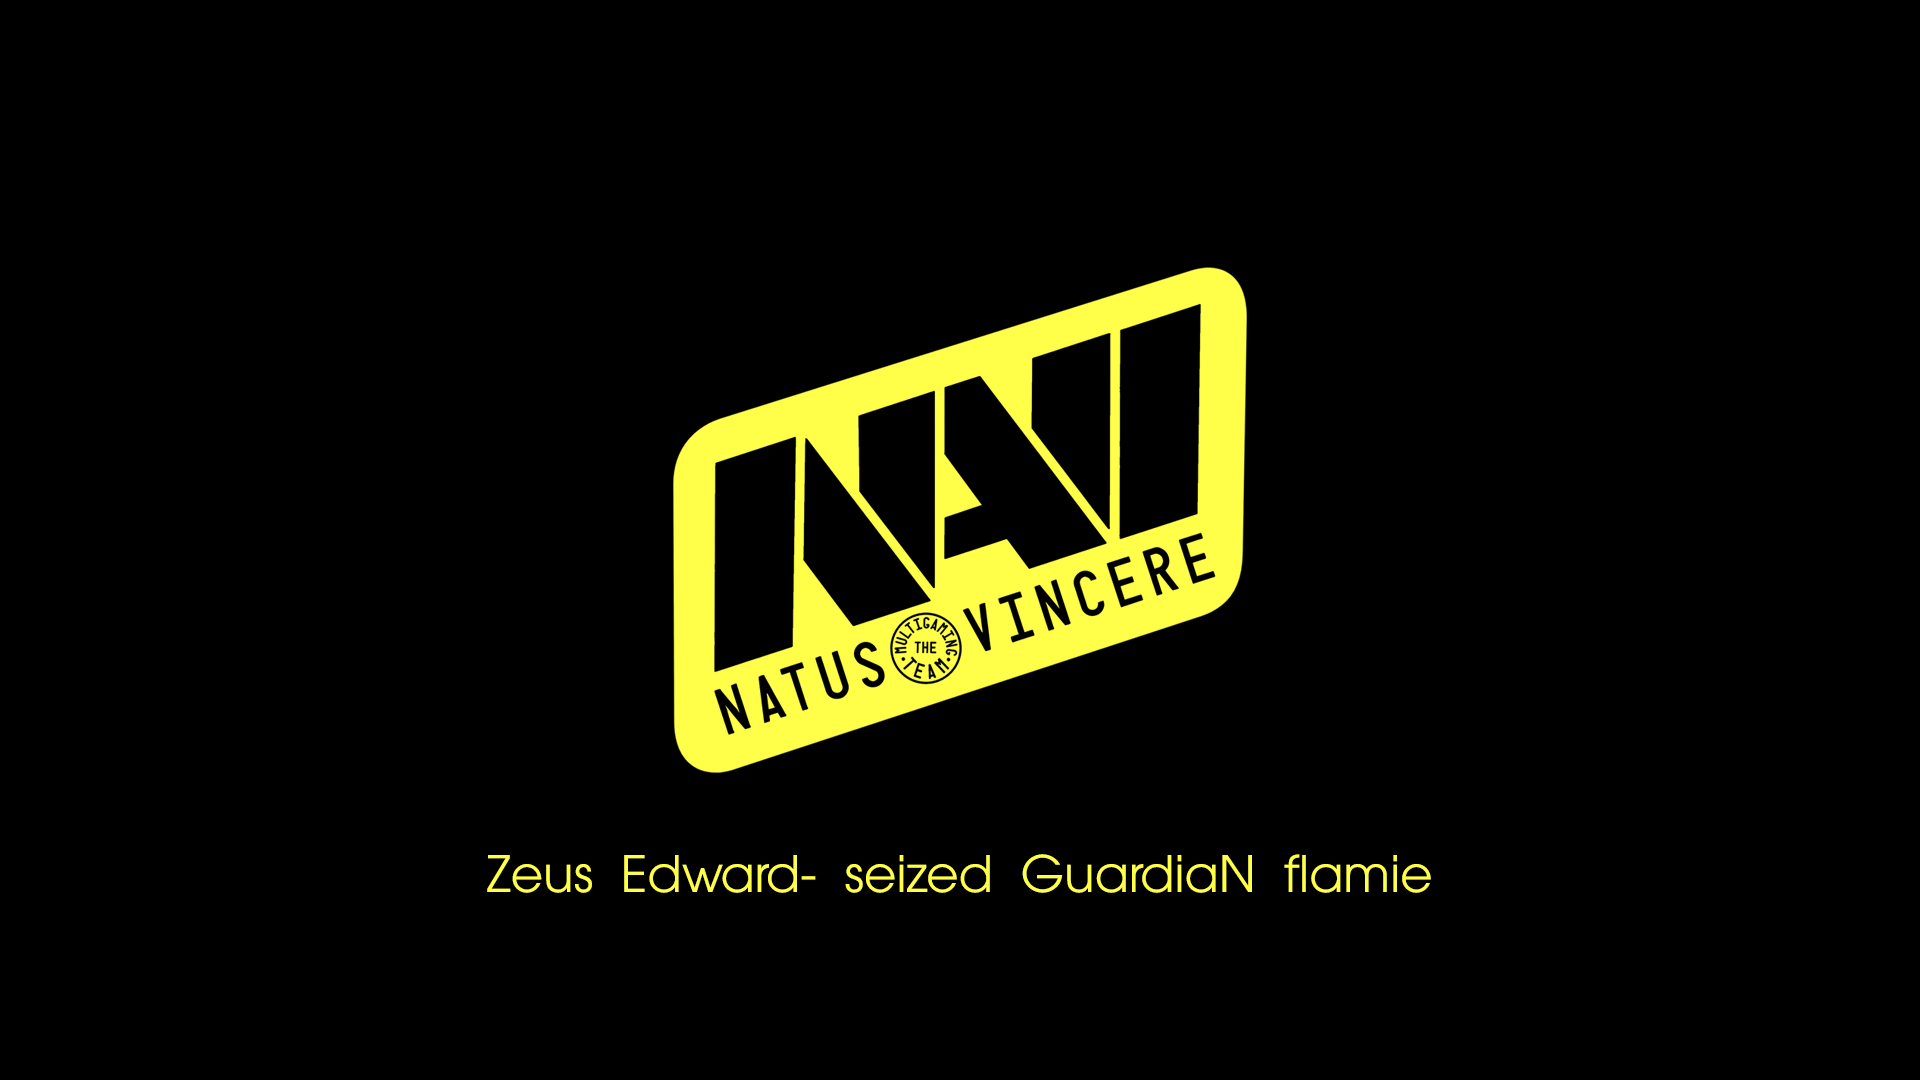 Navi black/yellow